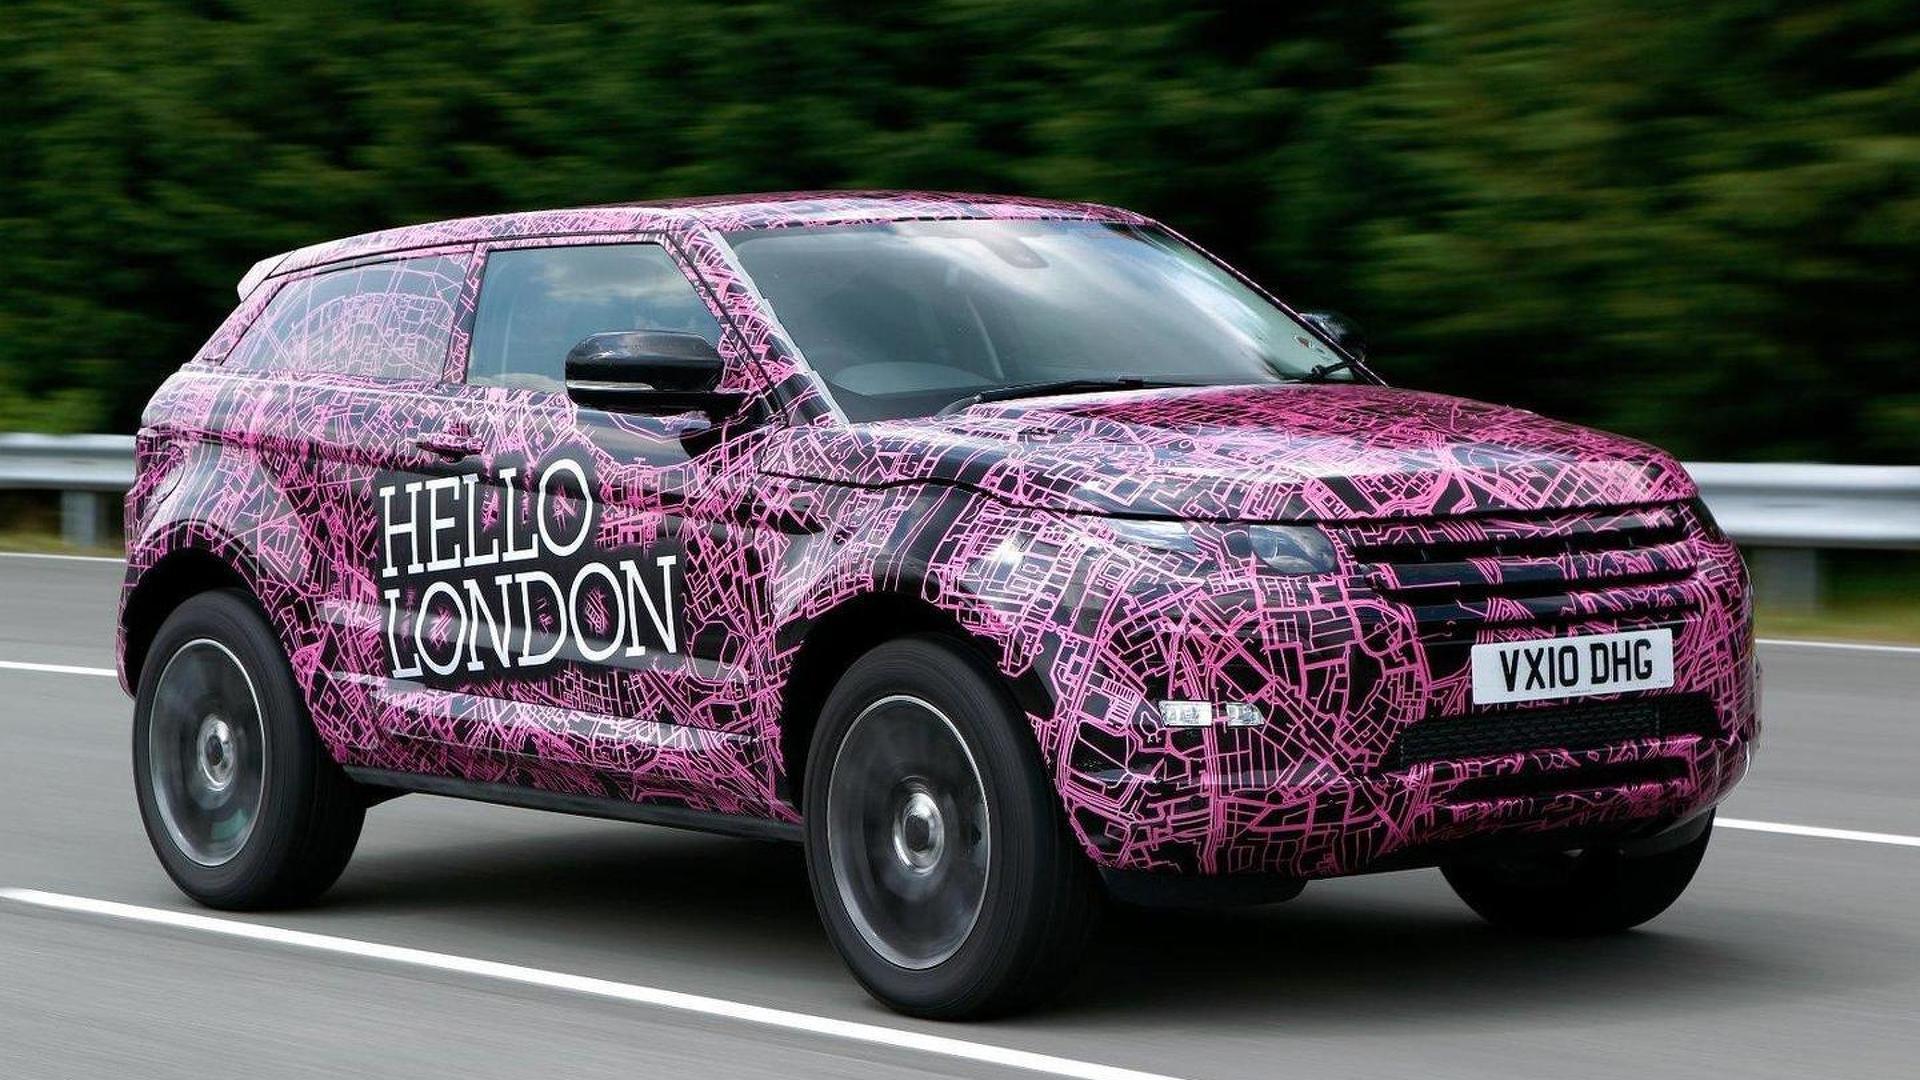 Range Rover Evoque enters final testing stage around the globe [video]